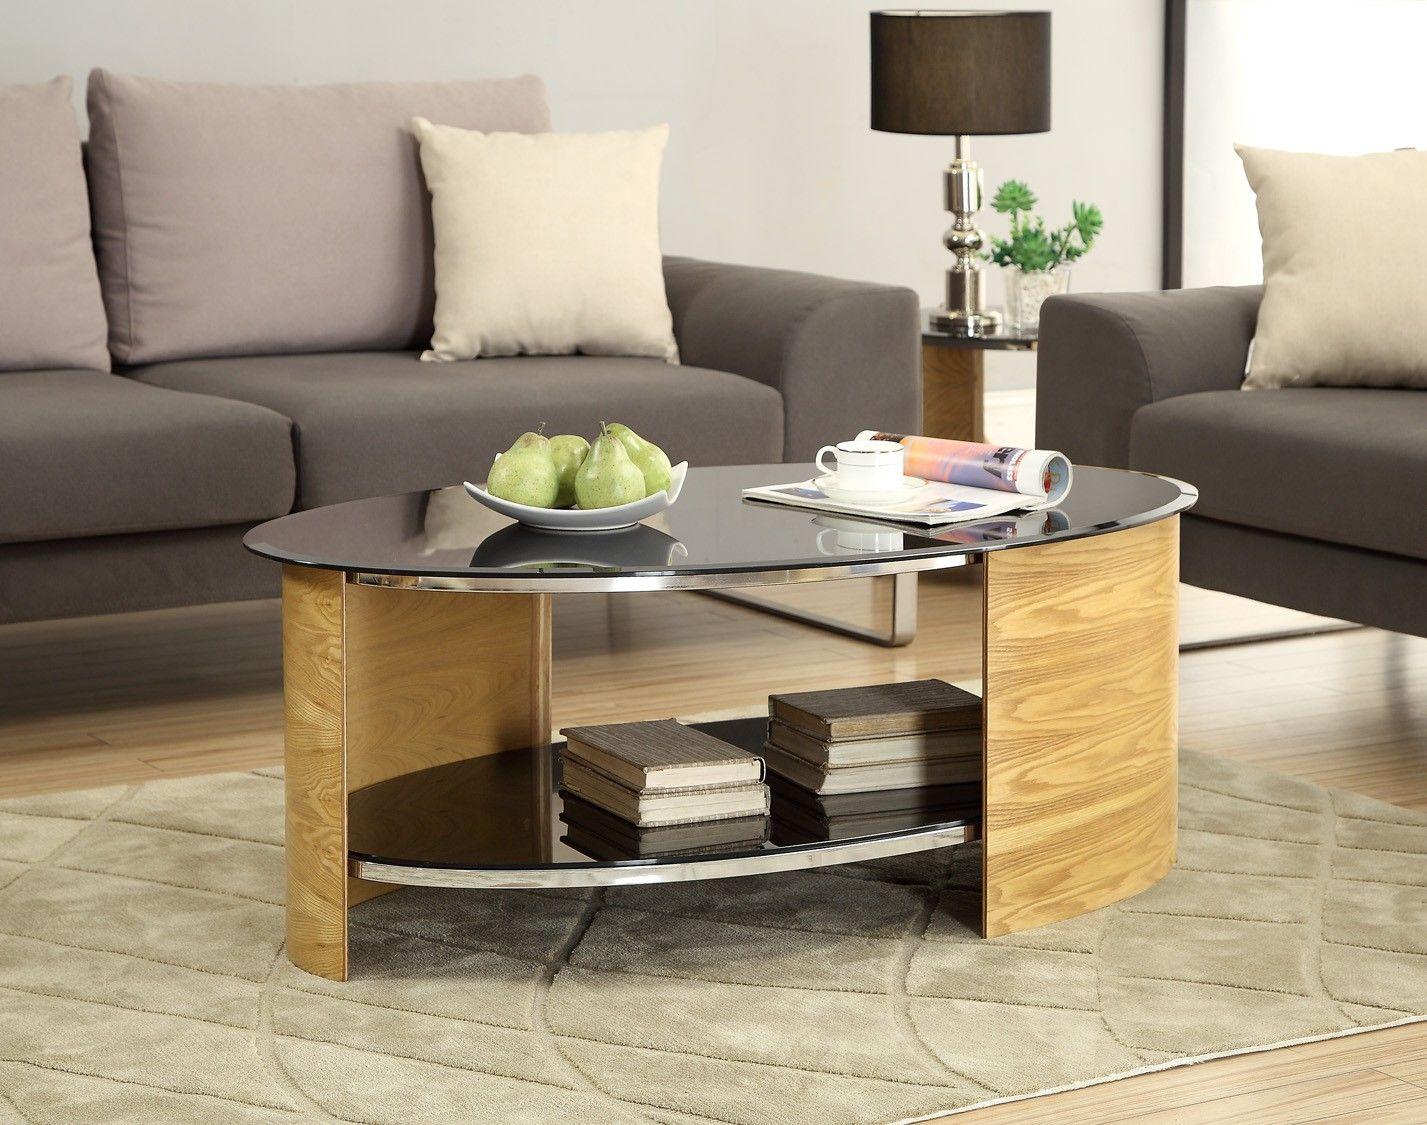 Jf301 San Marino Oval Coffee Table In Oak By Jual Coffee Table Wood Metal Living Room Furniture Coffee Table [ 1125 x 1427 Pixel ]